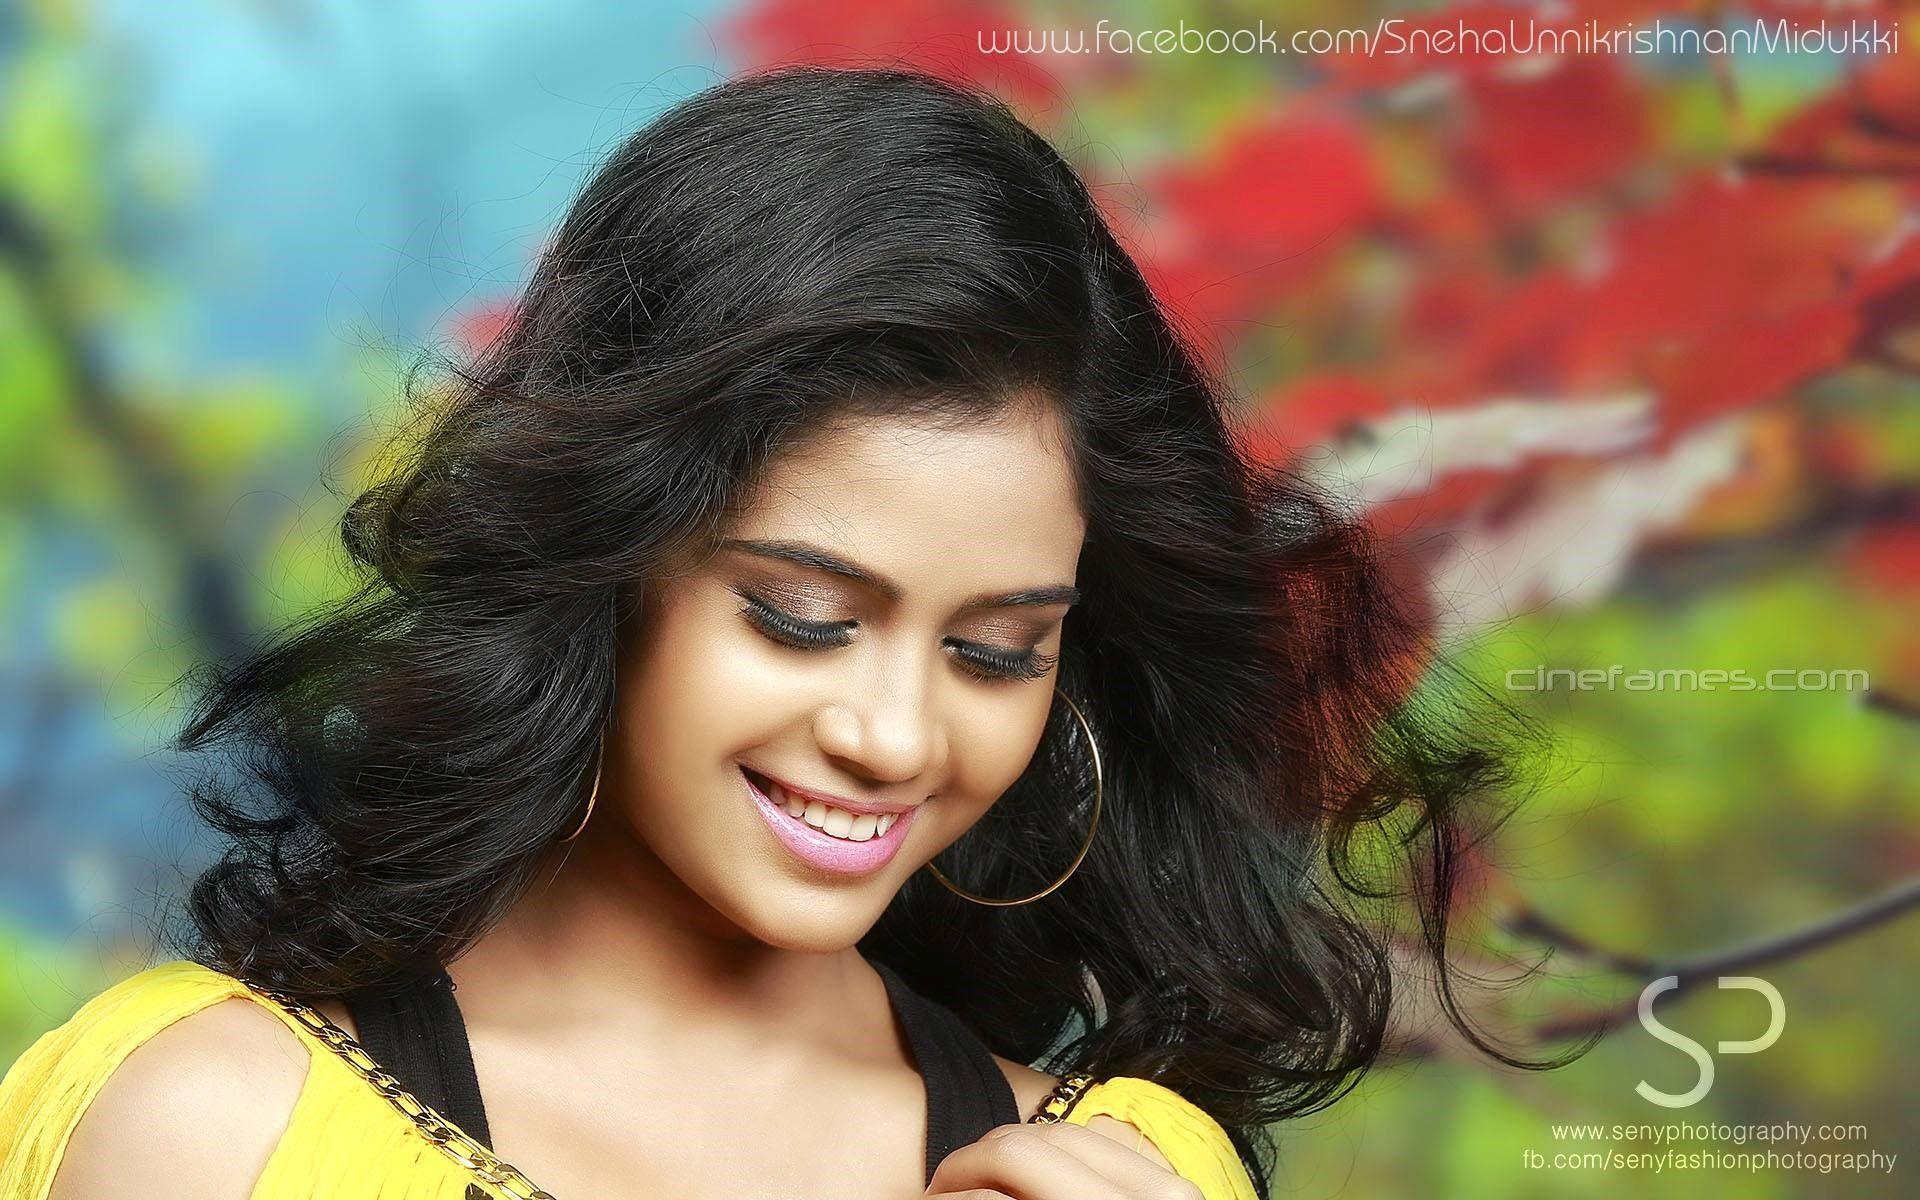 images Sneha Unnikrishnan